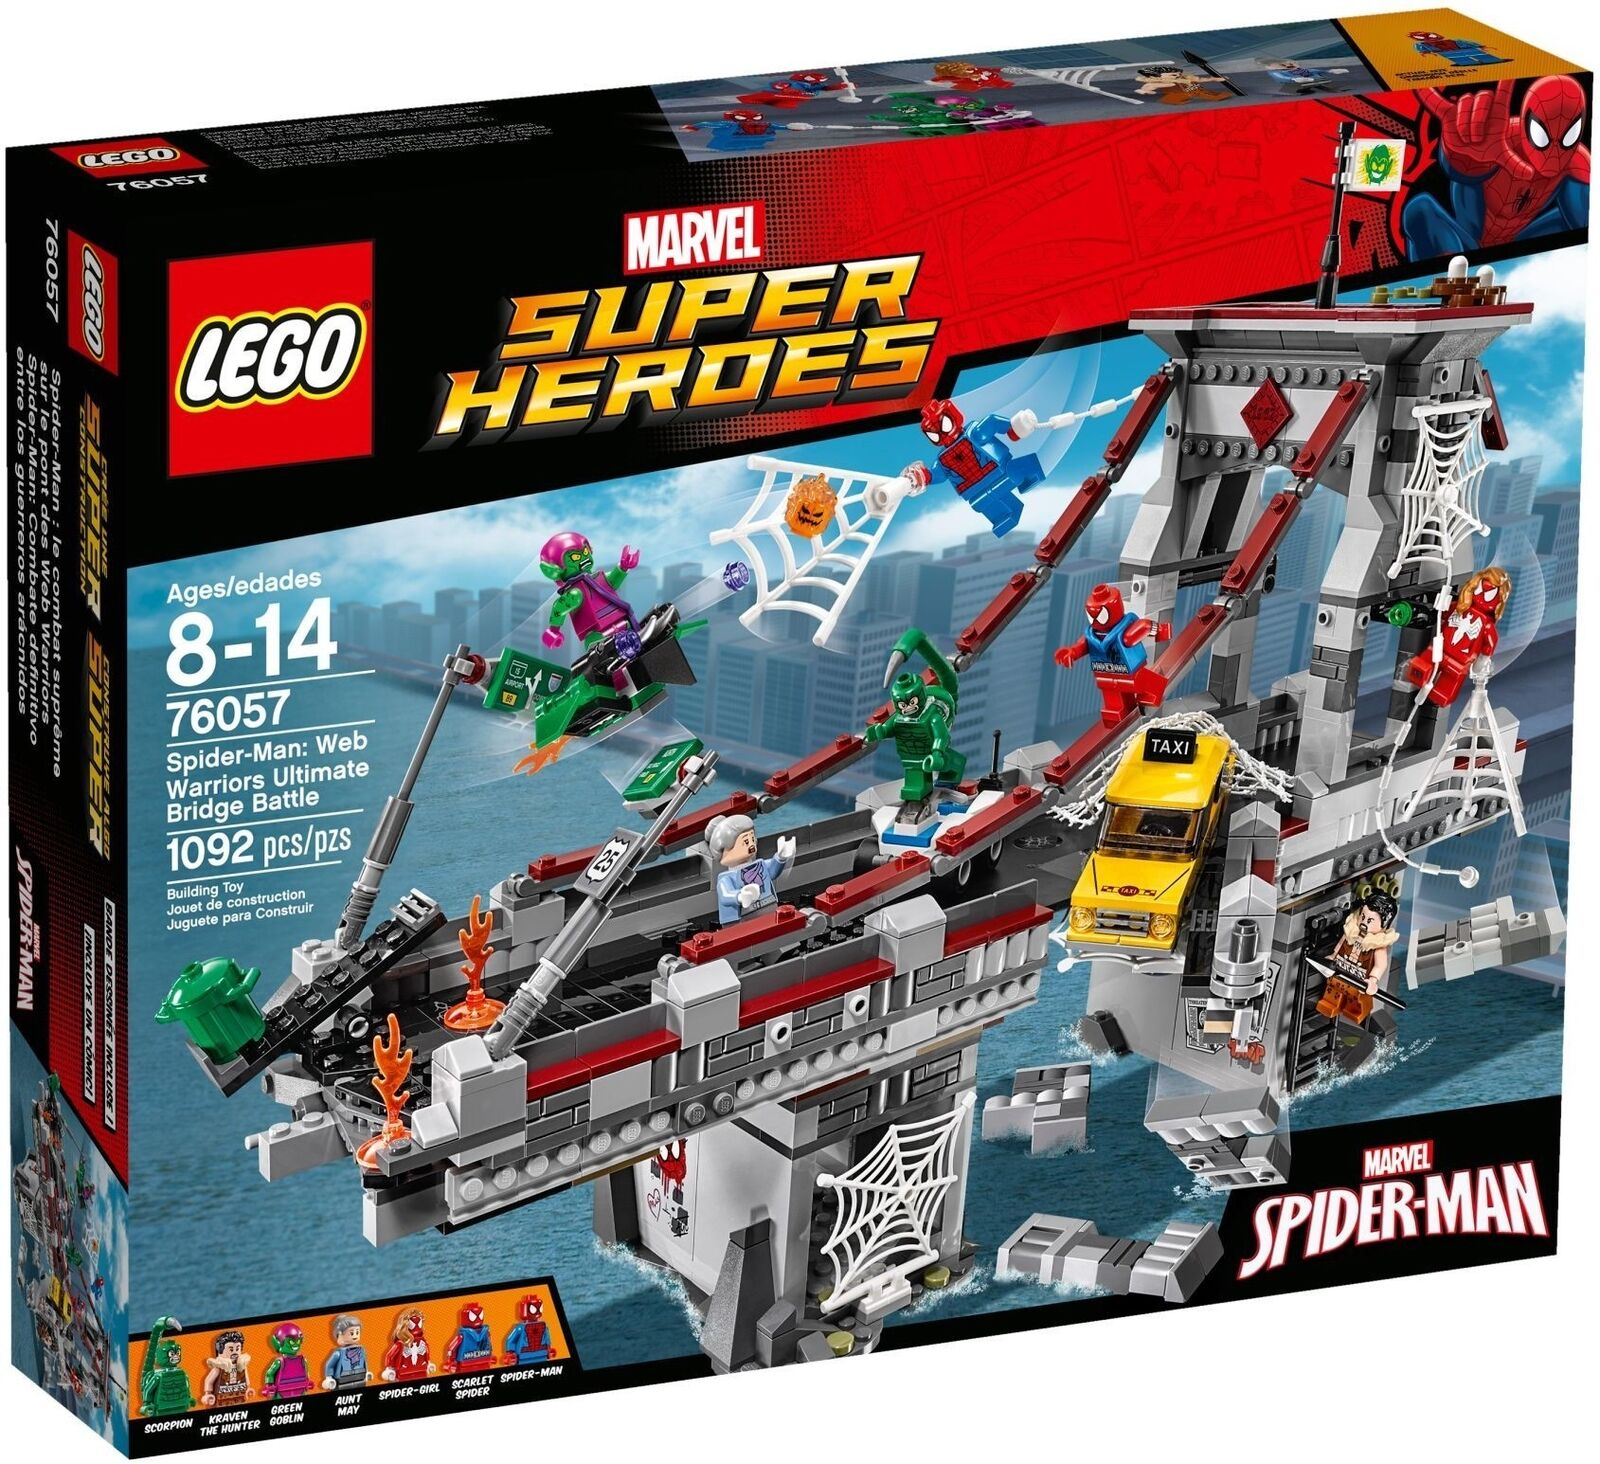 Lego ® Super Heroes Spider-Man  76057 brückenduell final nuevo embalaje original New misb